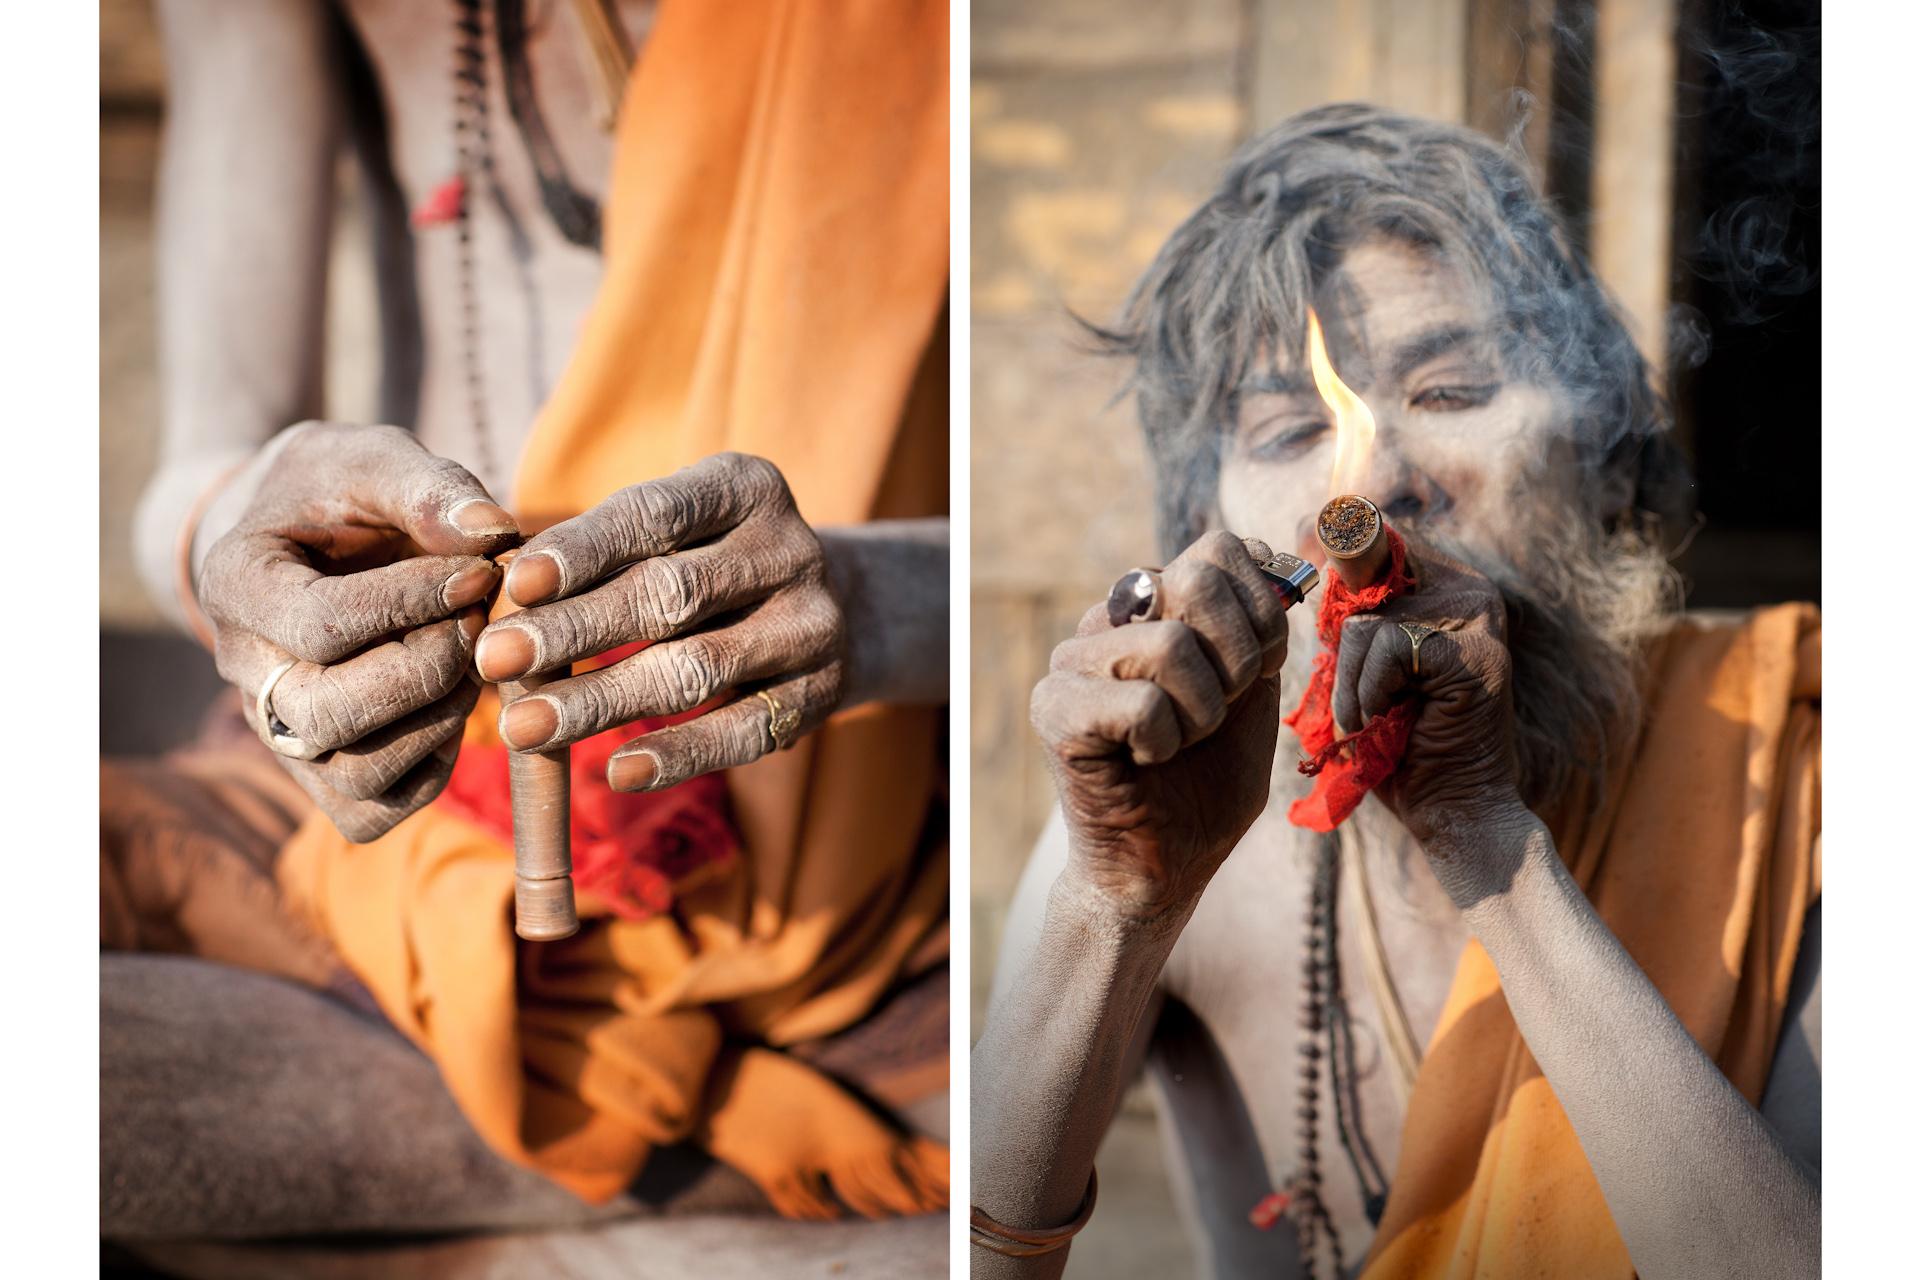 Nepal-Kathmandu-Travel-Sadhu-Smoke-Pashupatinath-Hindu_2.JPG